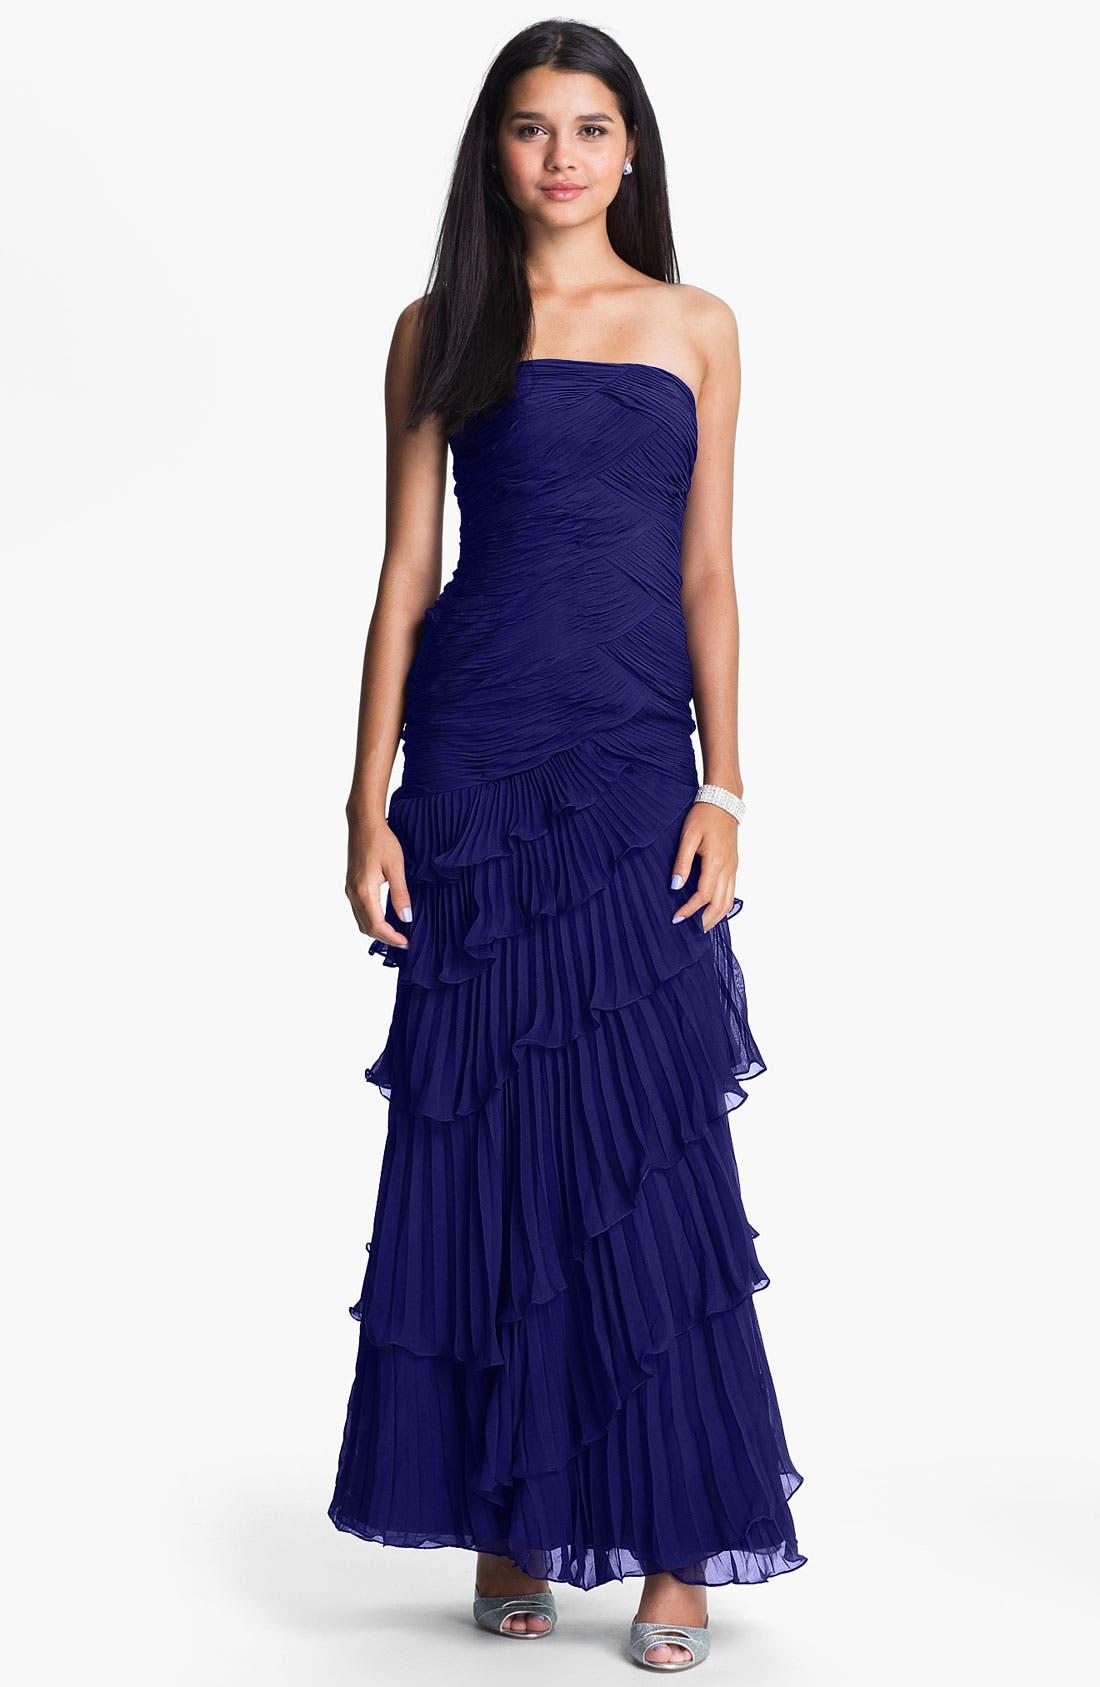 Alternate Image 1 Selected - Dalia MacPhee Gown & Accessories